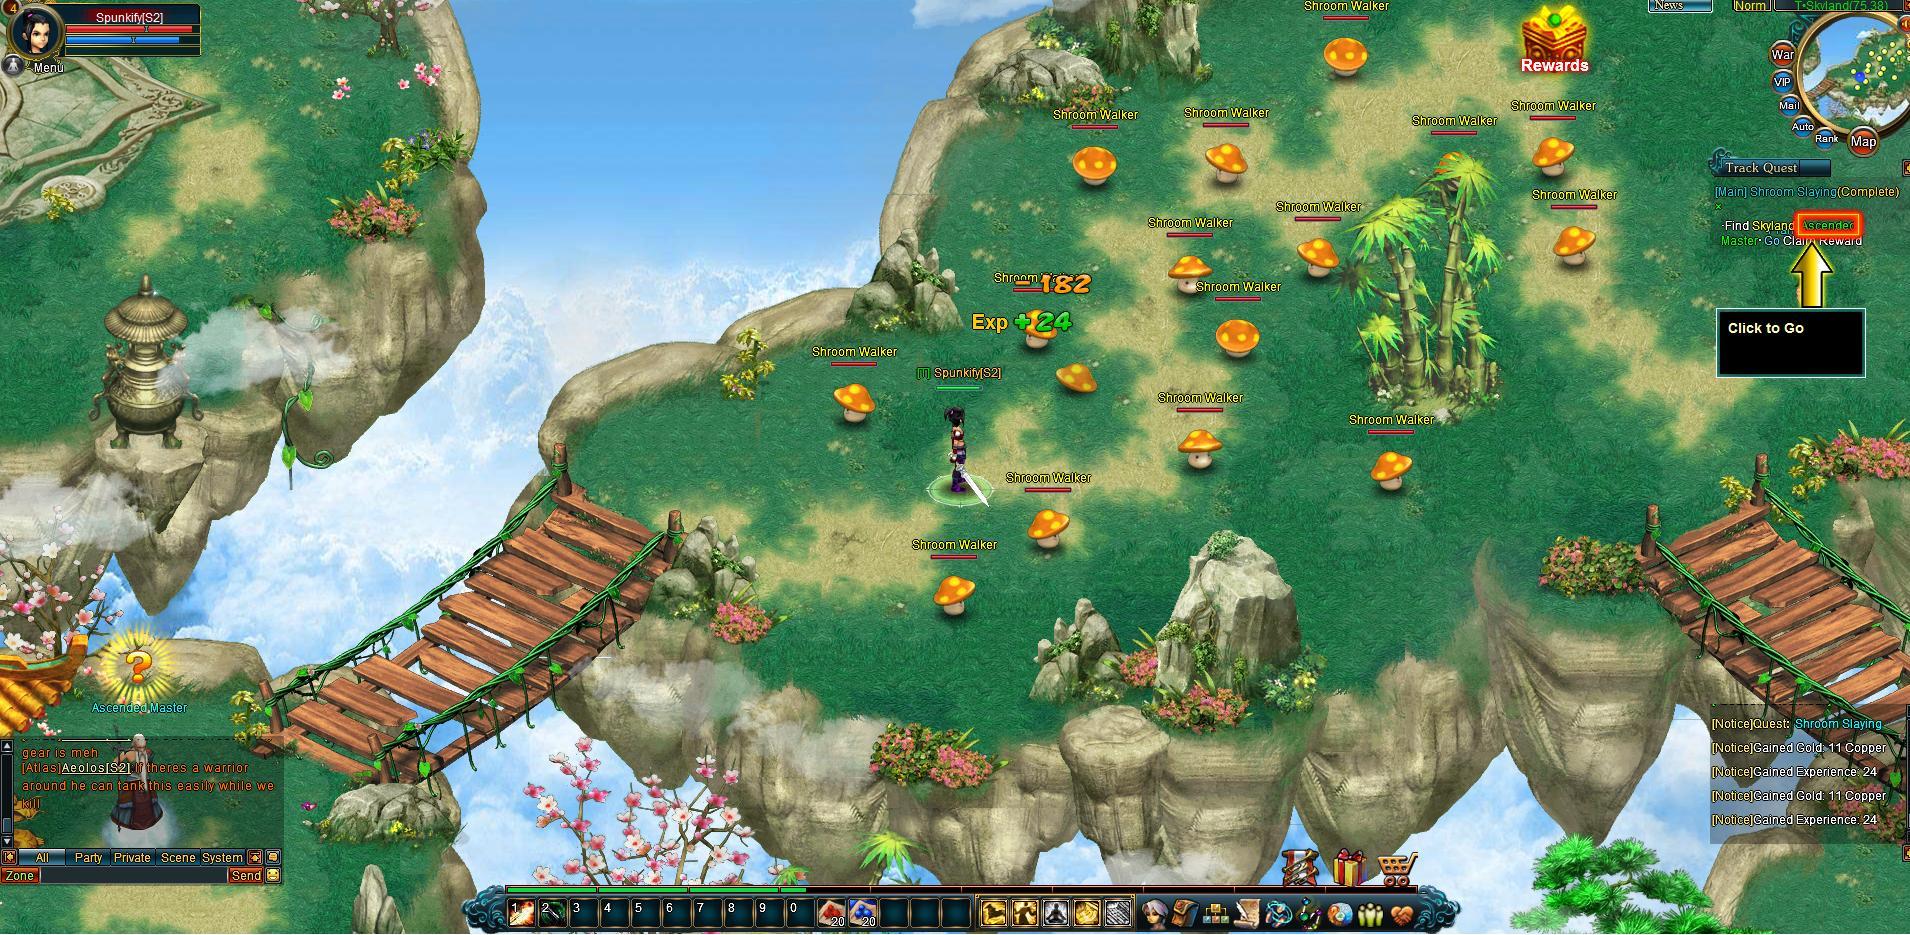 Mythic-Saga-ScreenShots-combat